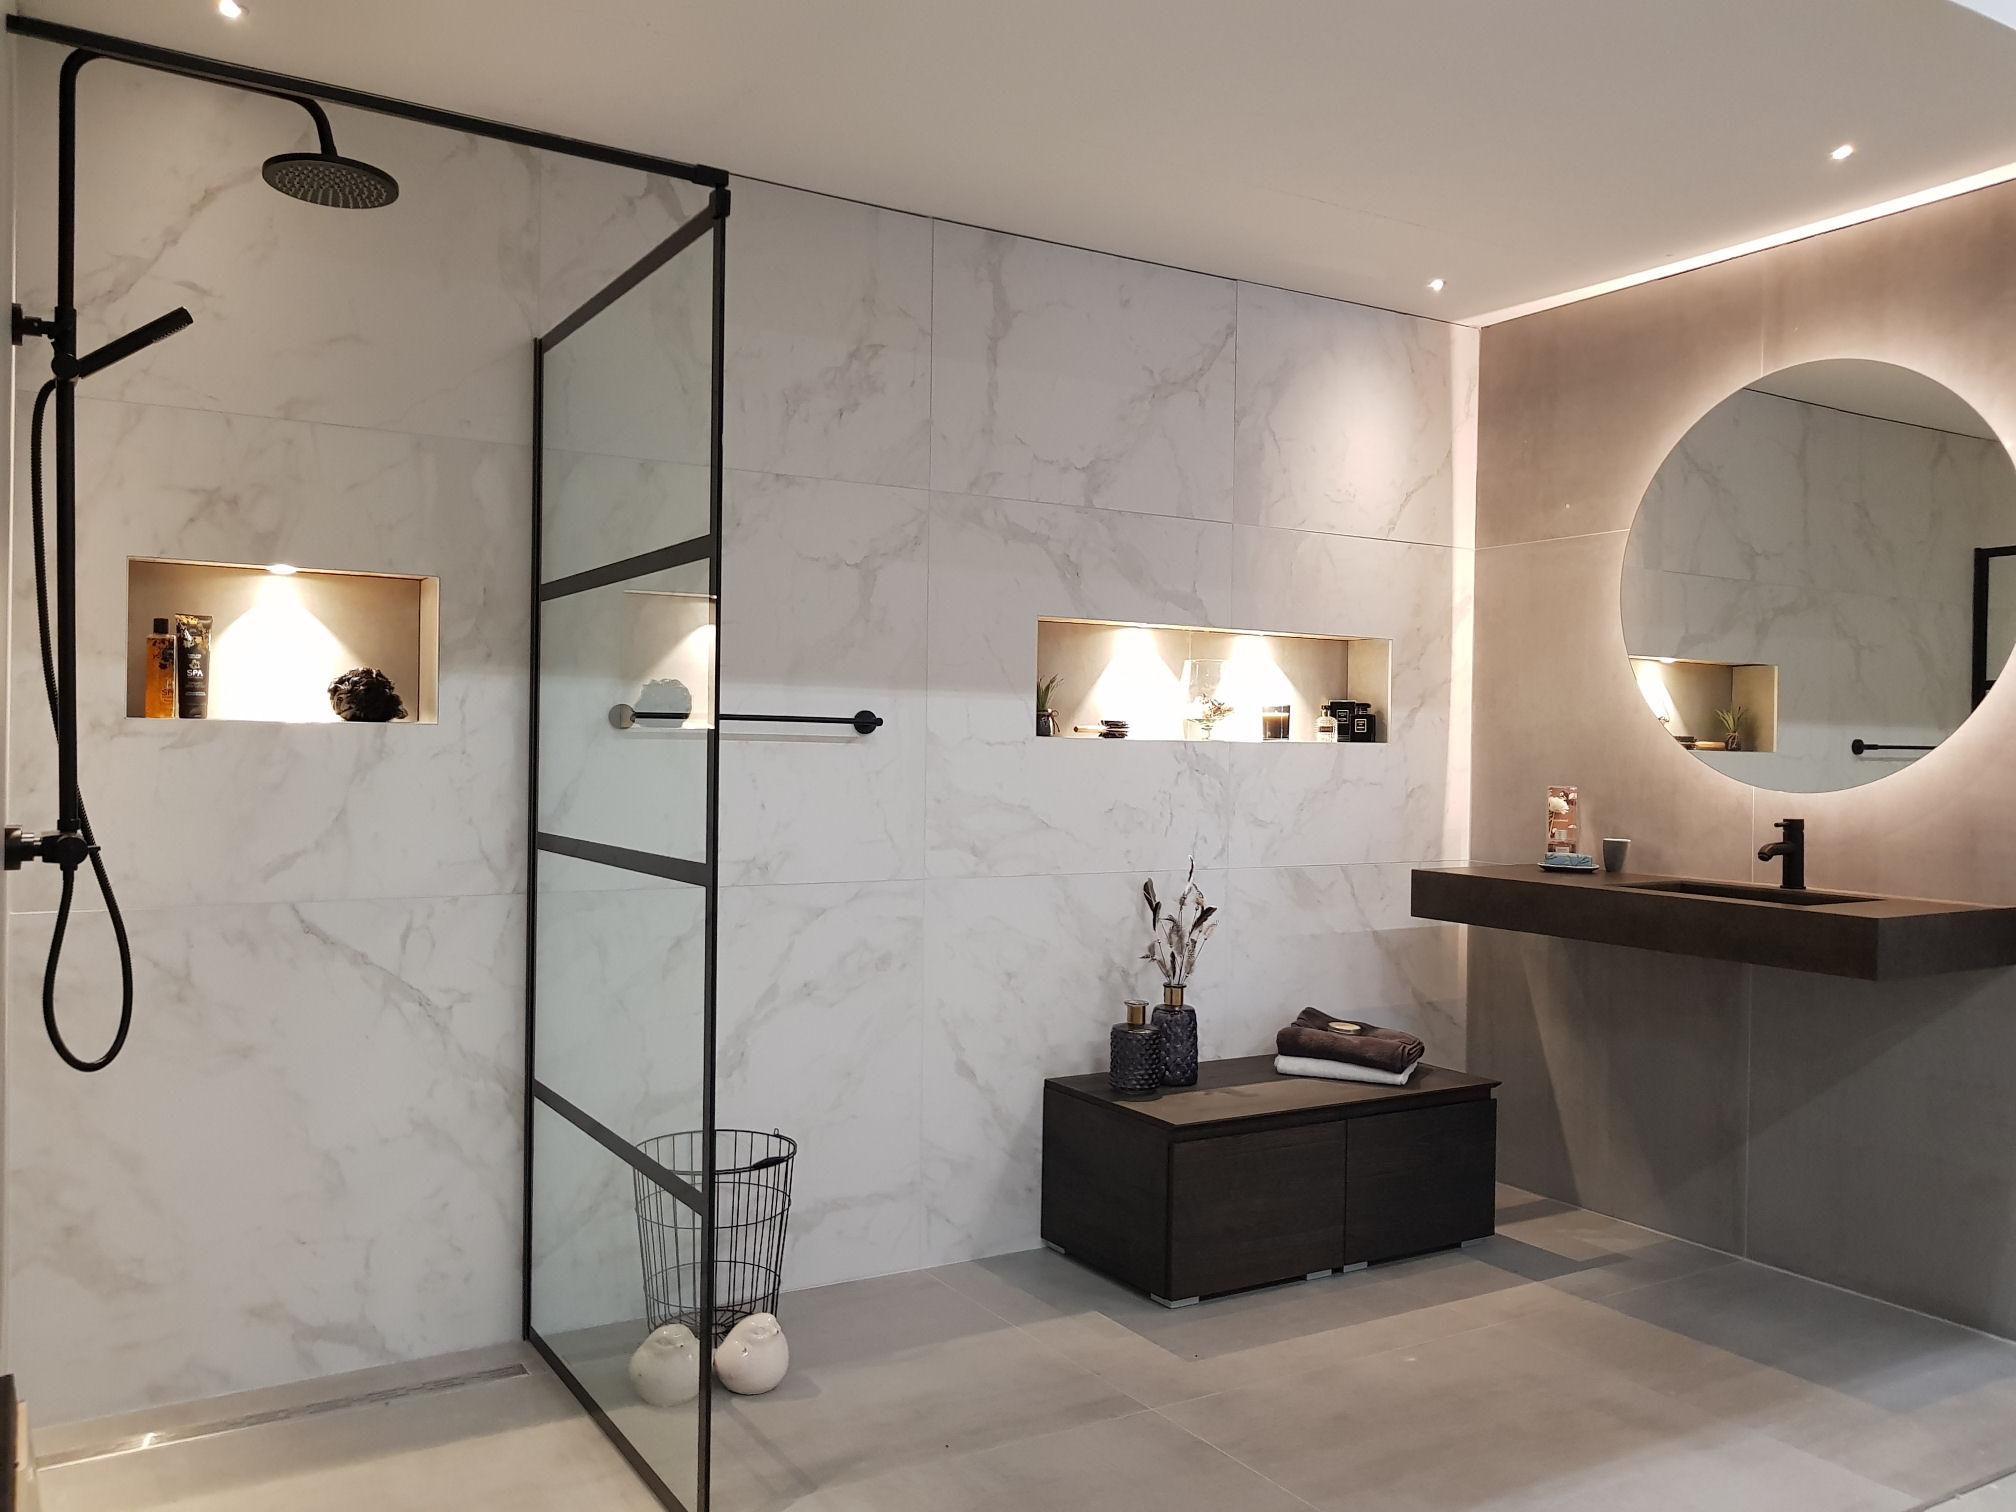 Best ronde spiegel badkamer pictures new home design